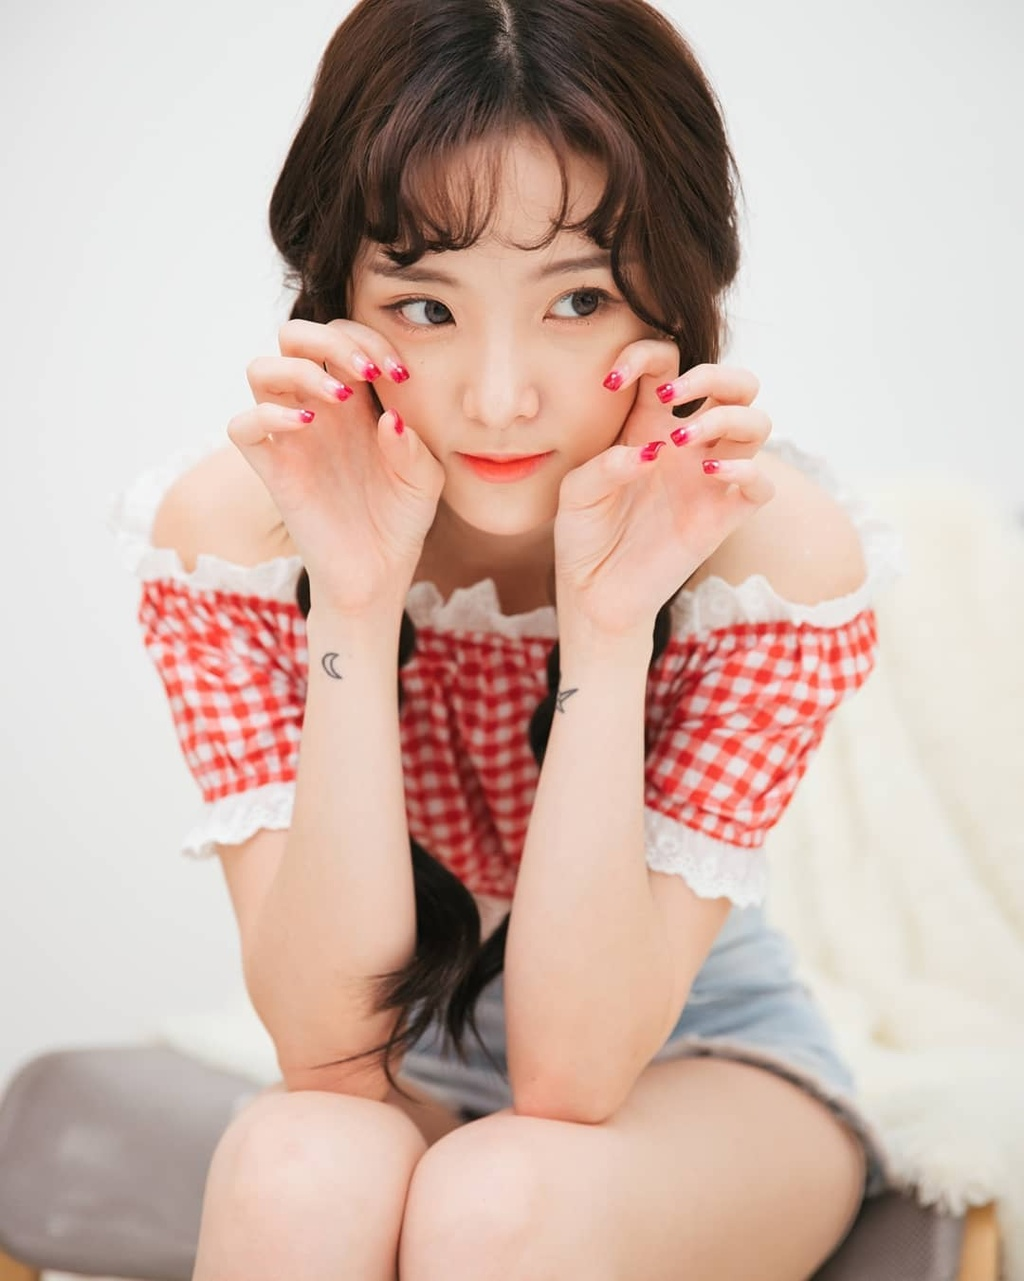 Hot girl 'Lat mat 3' cua Ly Hai tham gia show song con ban Trung hinh anh 12 44636925_314548639273642_1322548302472848029_n.jpg